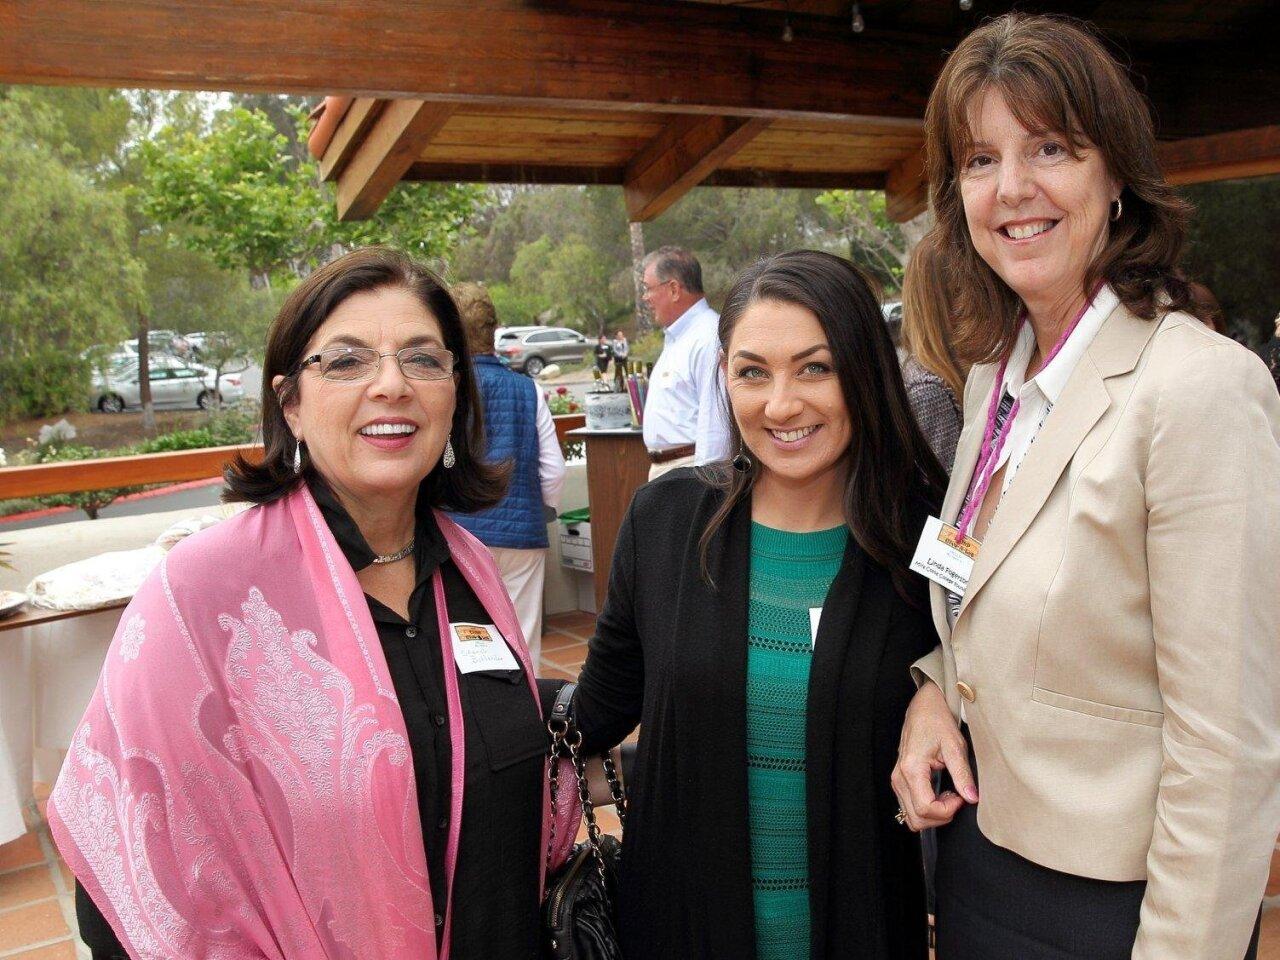 Sheryl Bohlander, Diana Goodman, Linda Fogerson